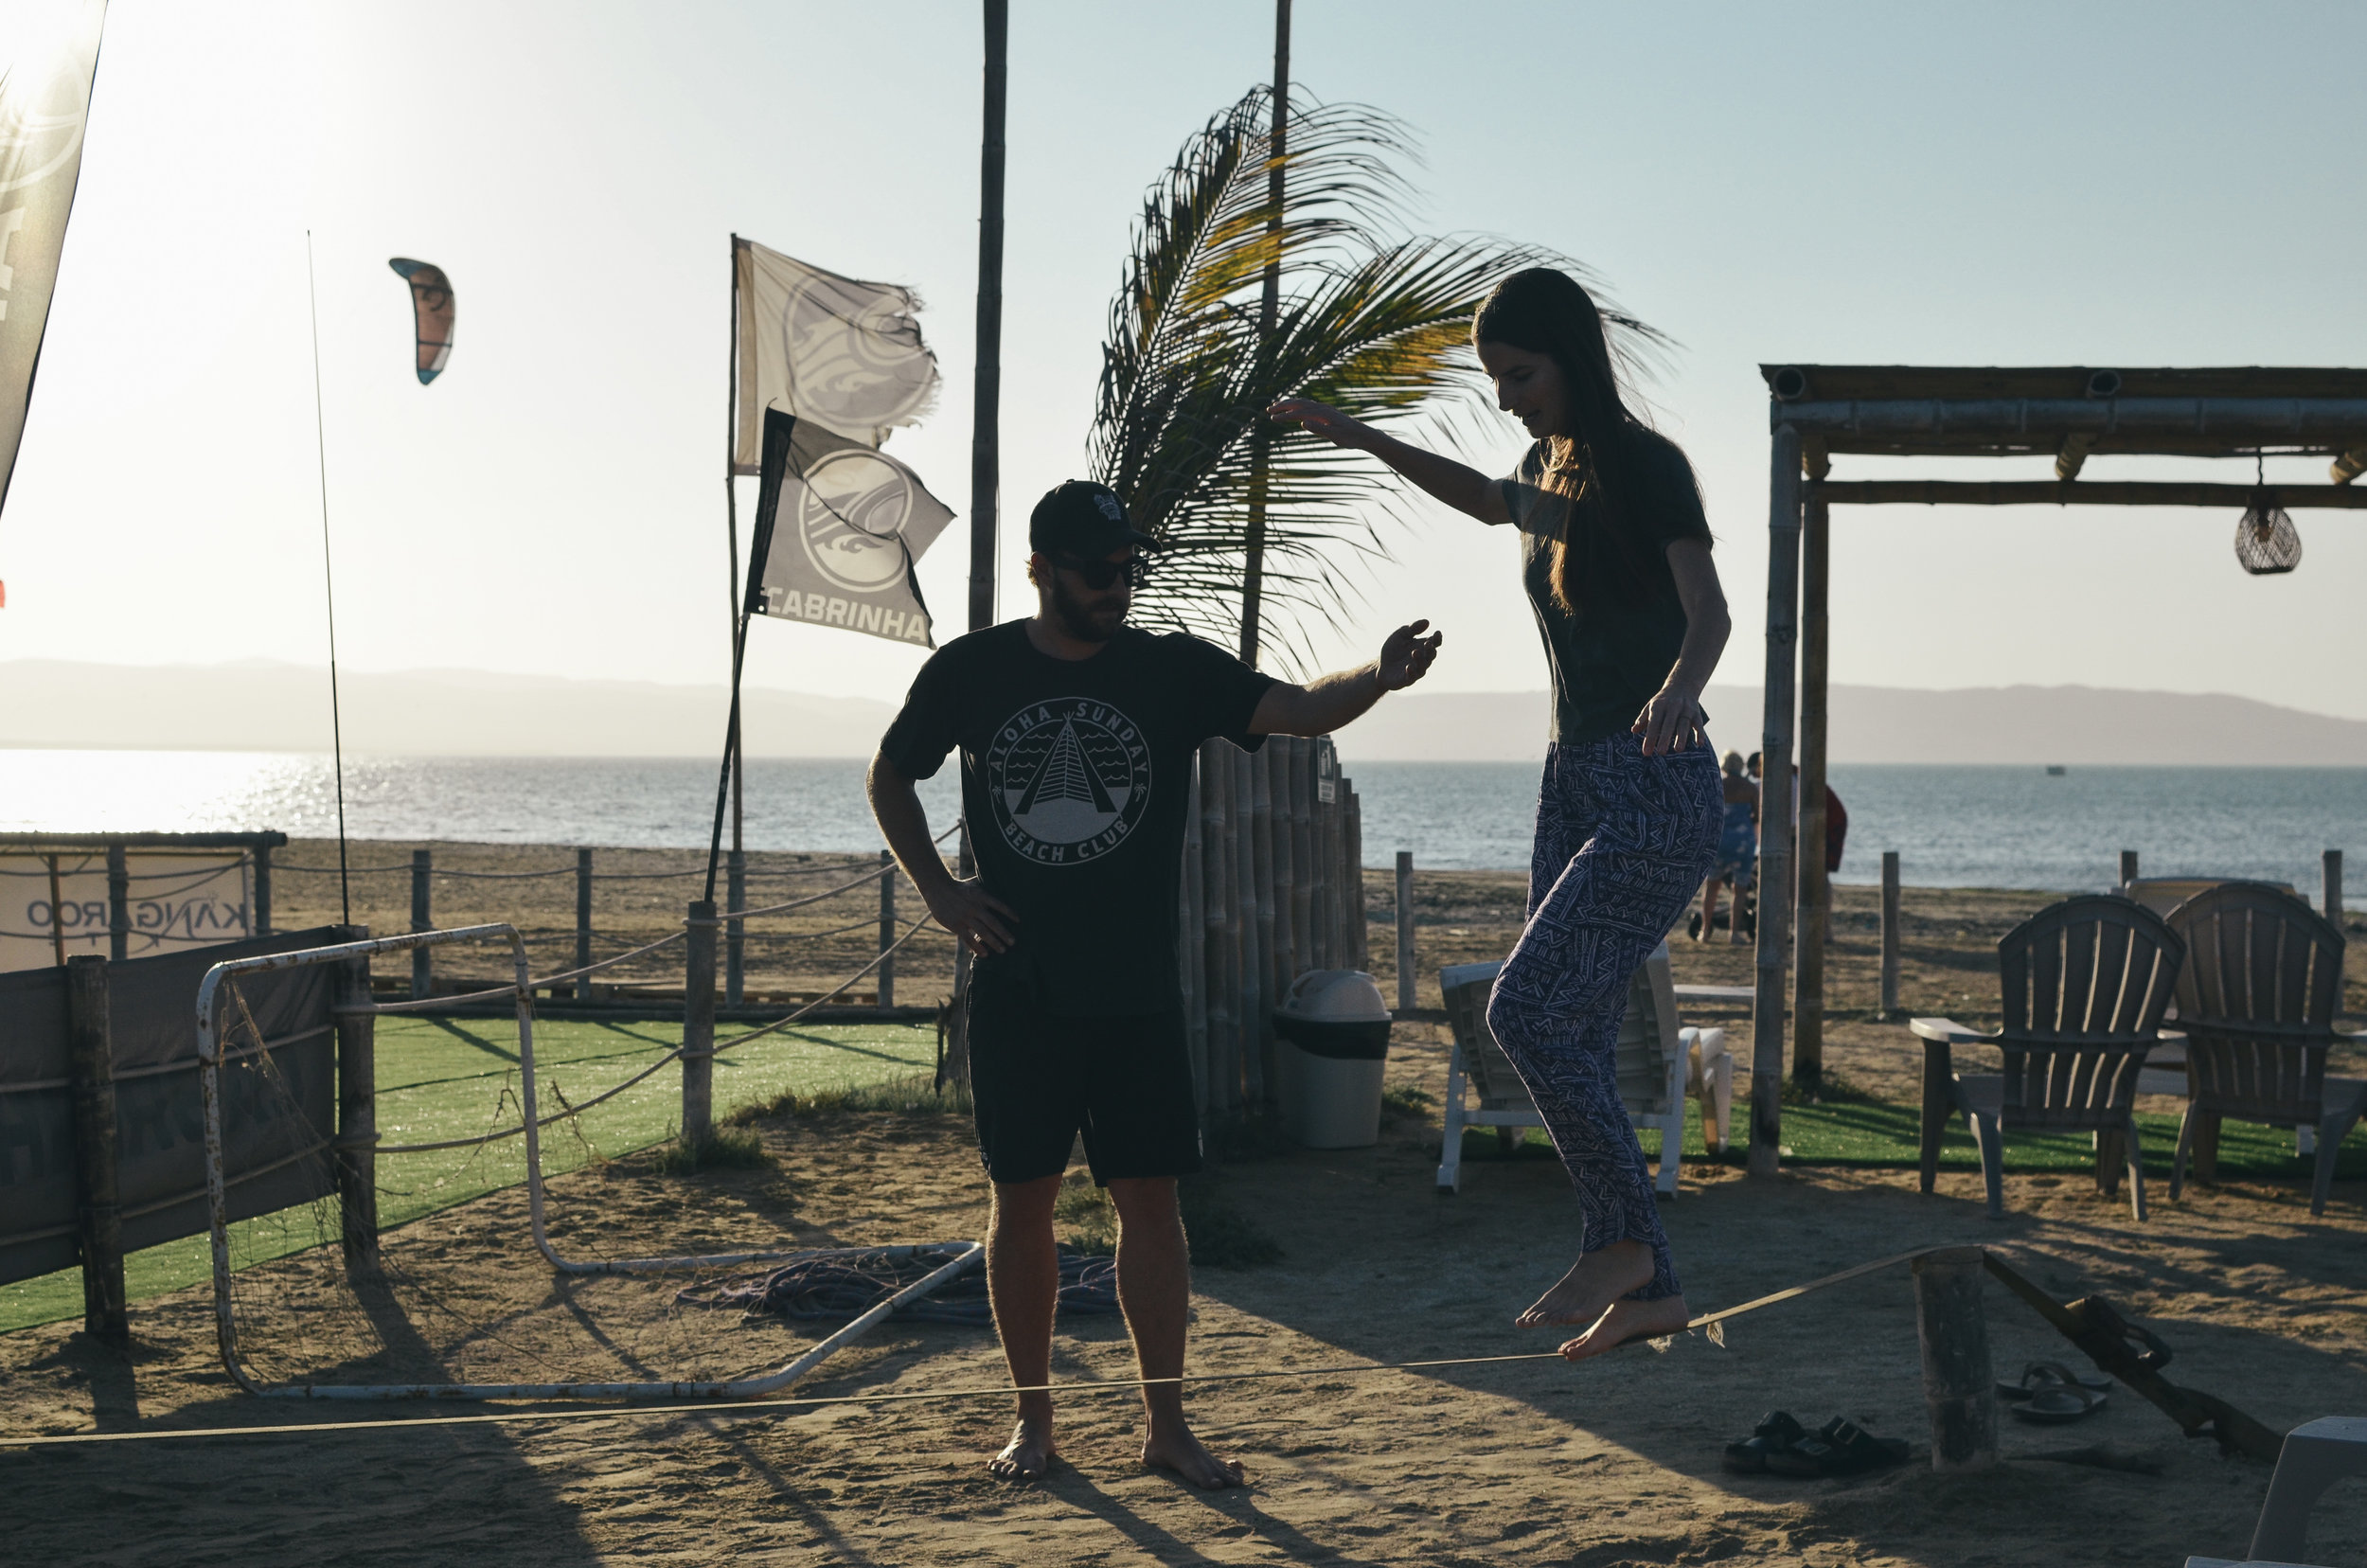 paracas+peru+travel+guide+life+on+pine_DSC_0030.jpg